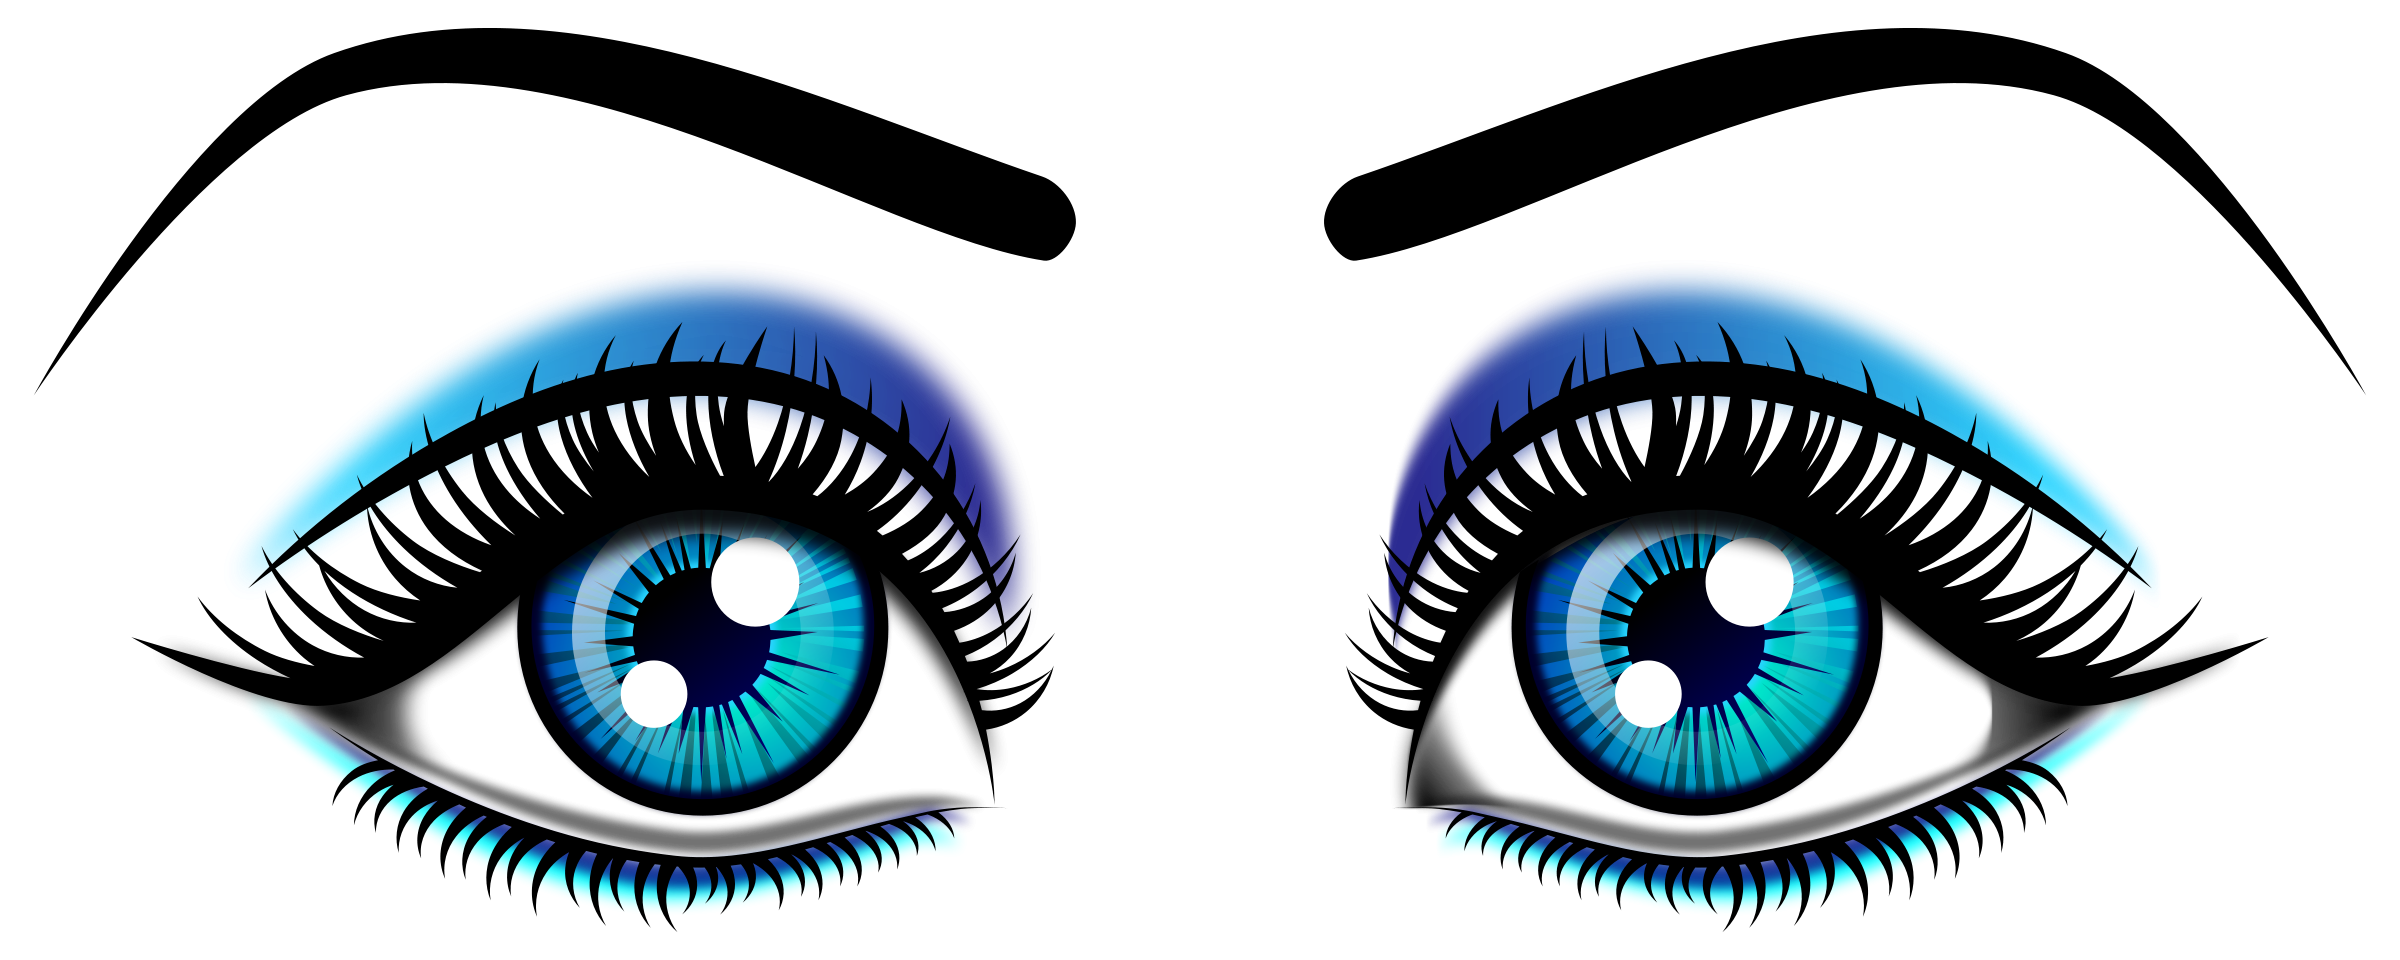 Clipart eyes human eye, Clipart eyes human eye Transparent.